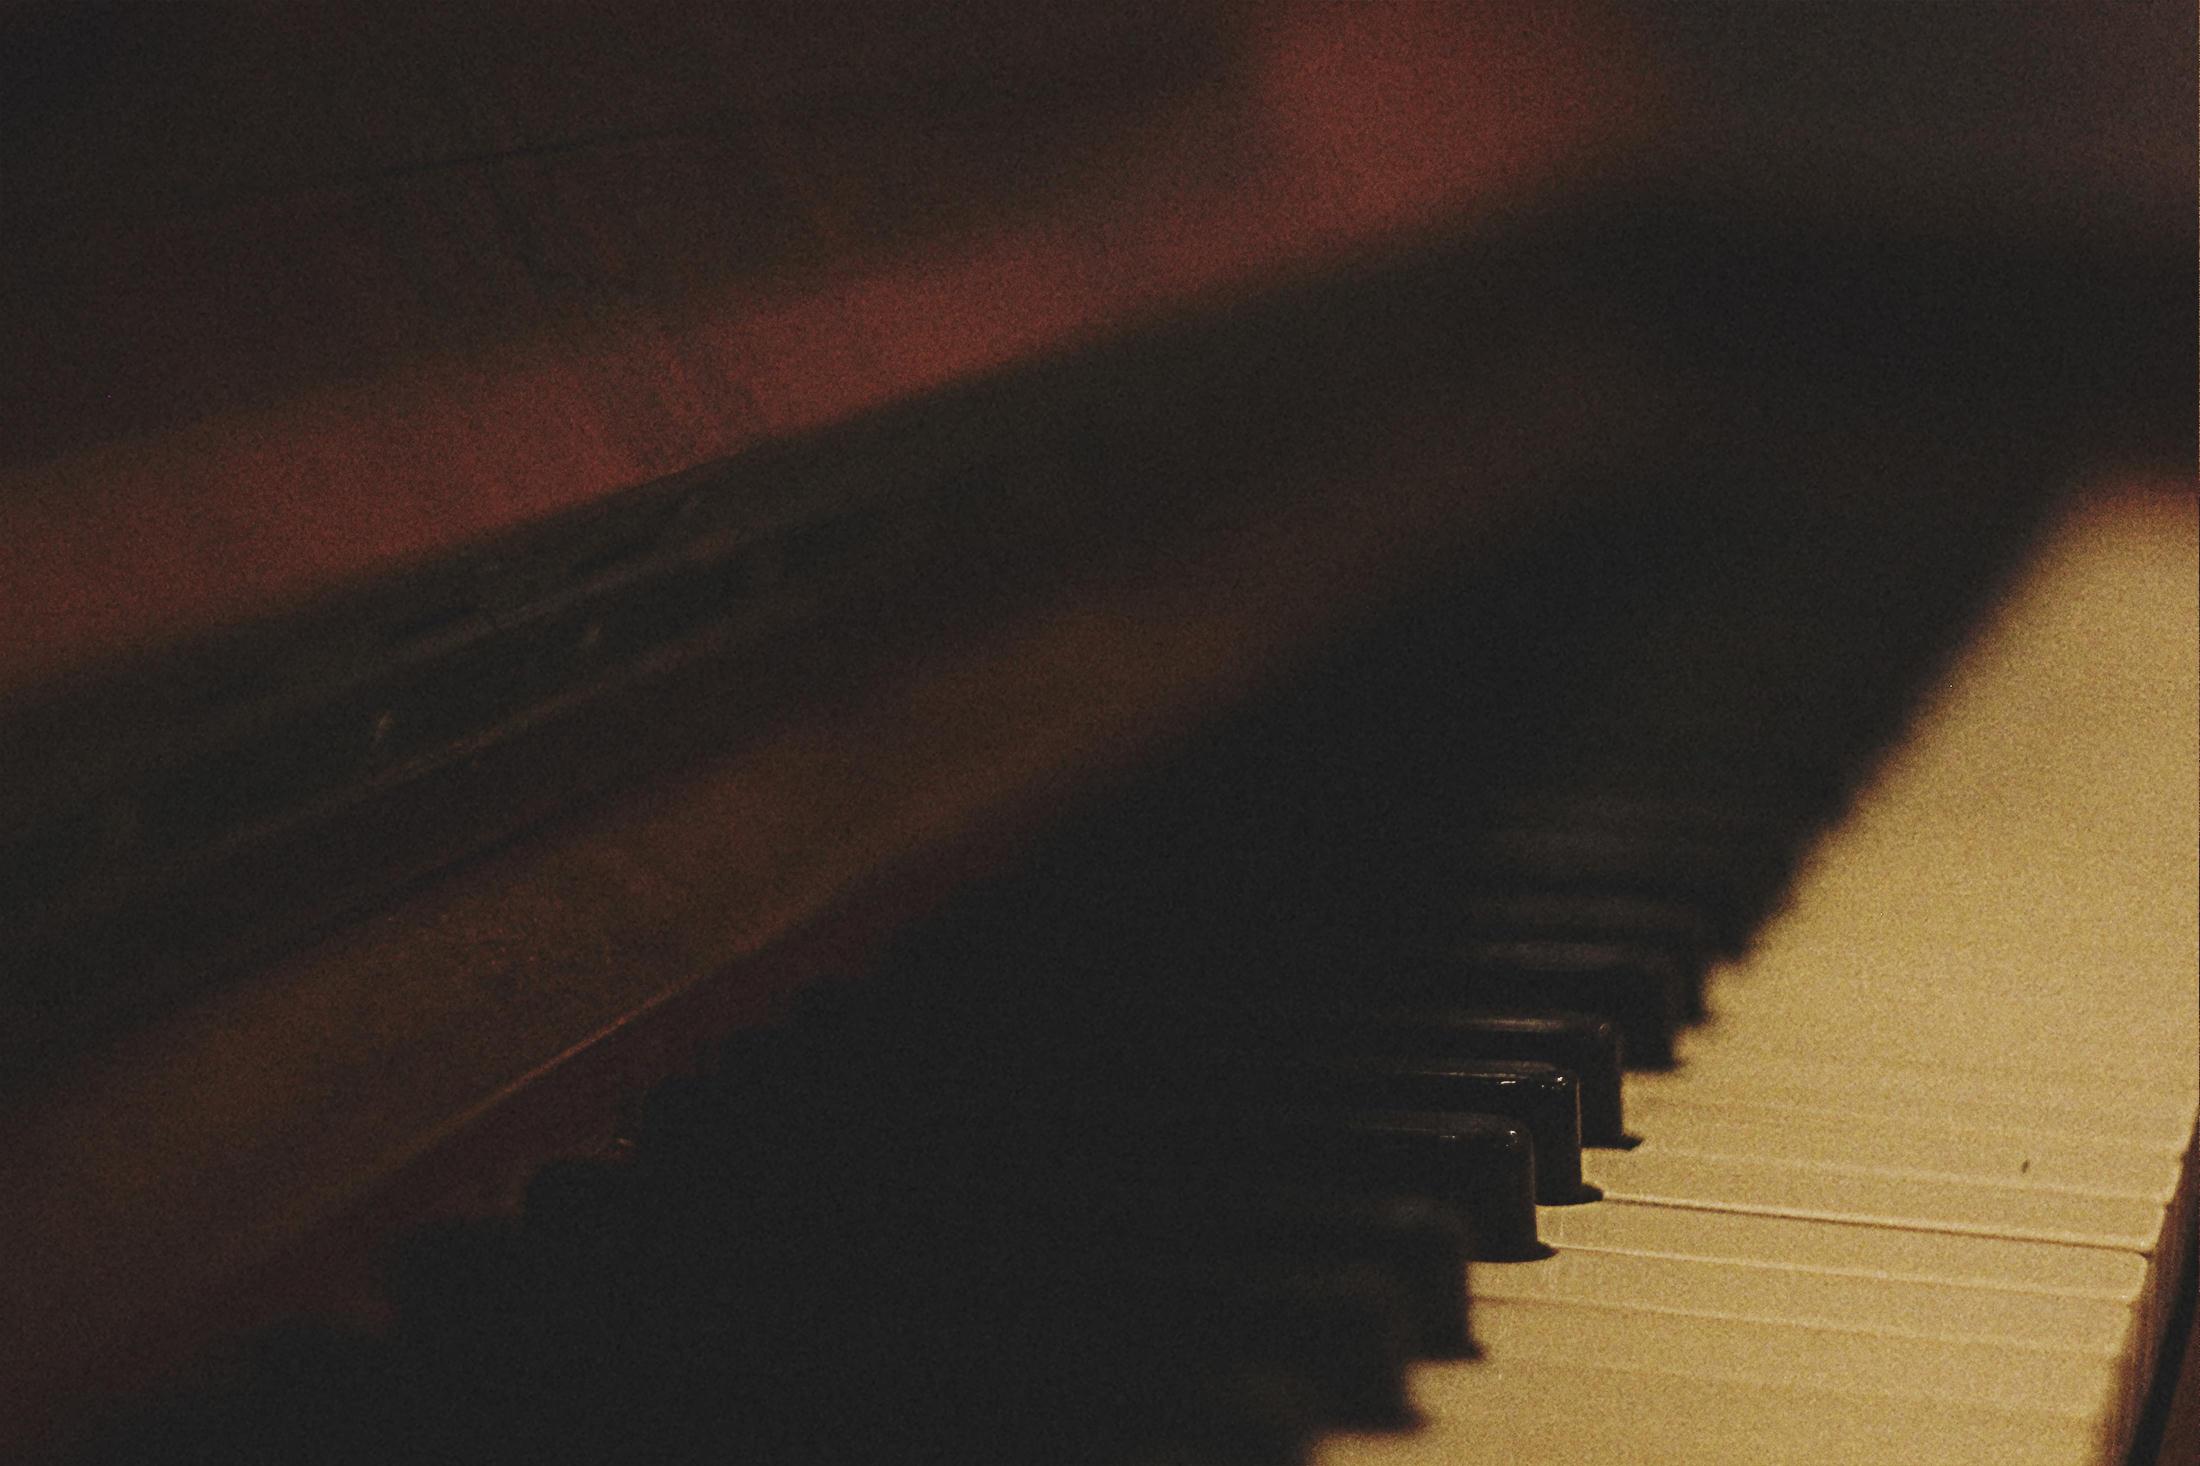 Beginning to, once again, find my song. | Image via    Viktor Mogilat/Unsplash